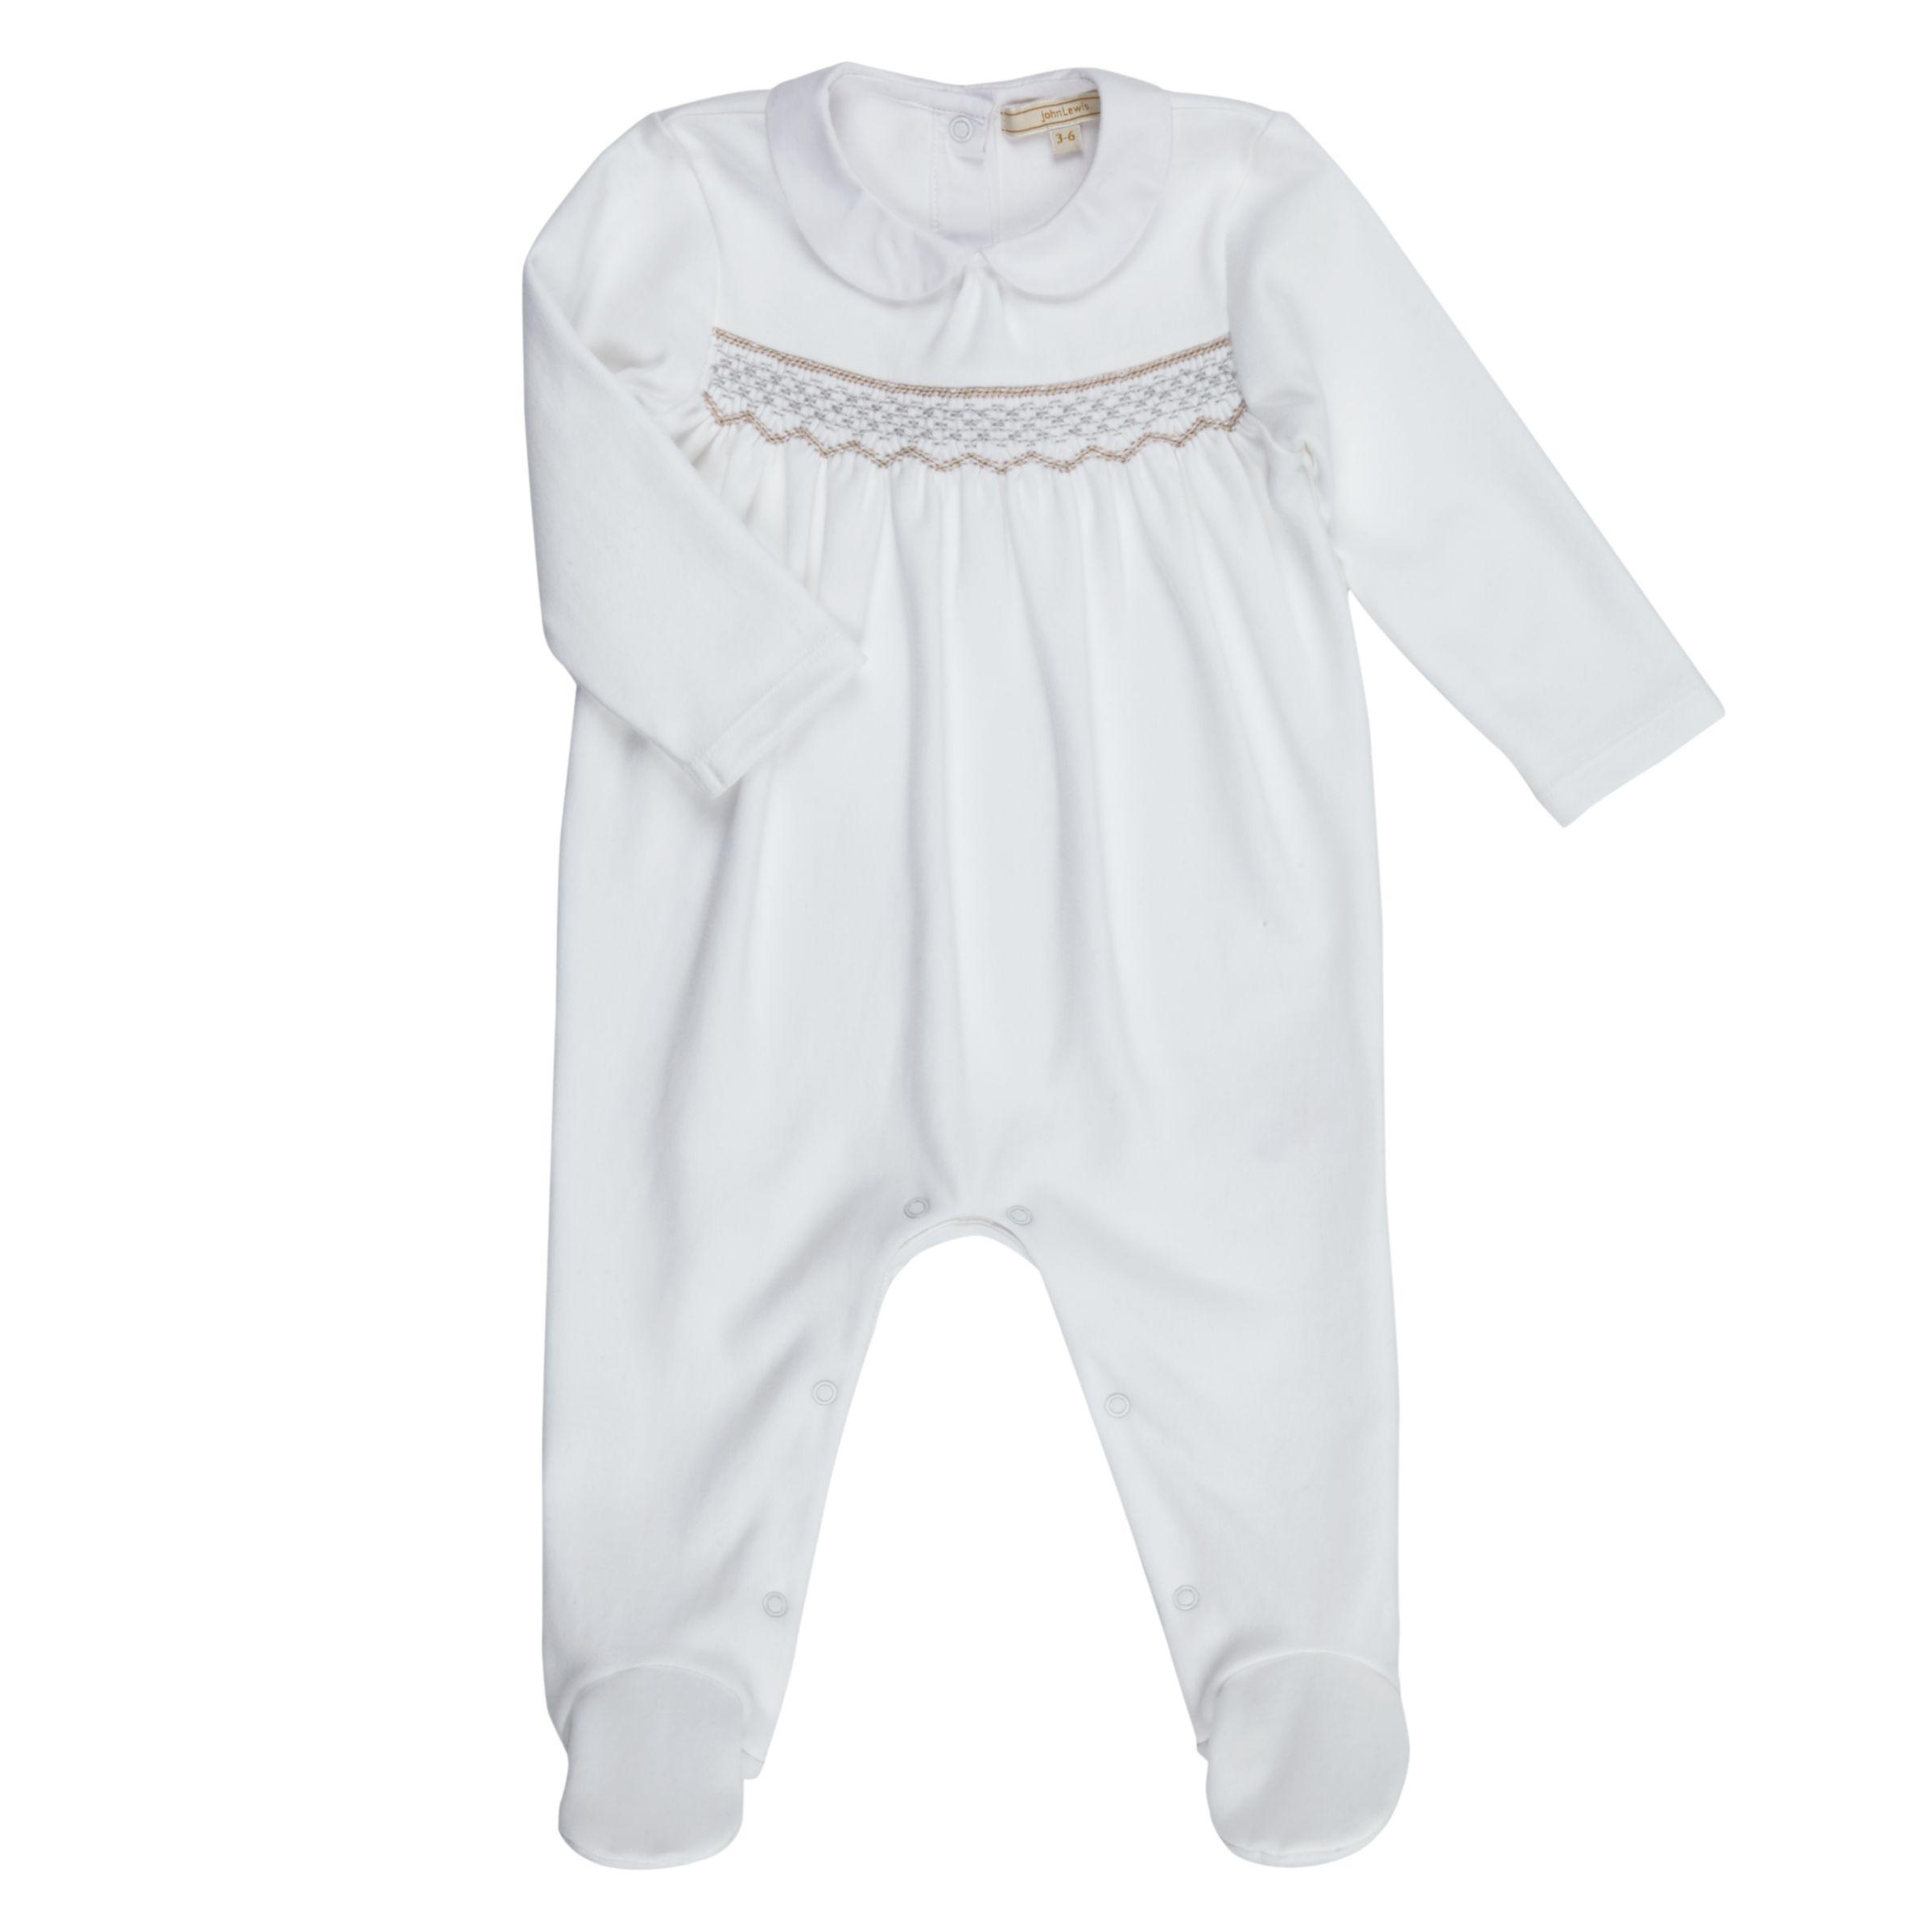 John Lewis Heirloom Collection John Lewis Heirloom Collection Baby Smock Sleepsuit, White